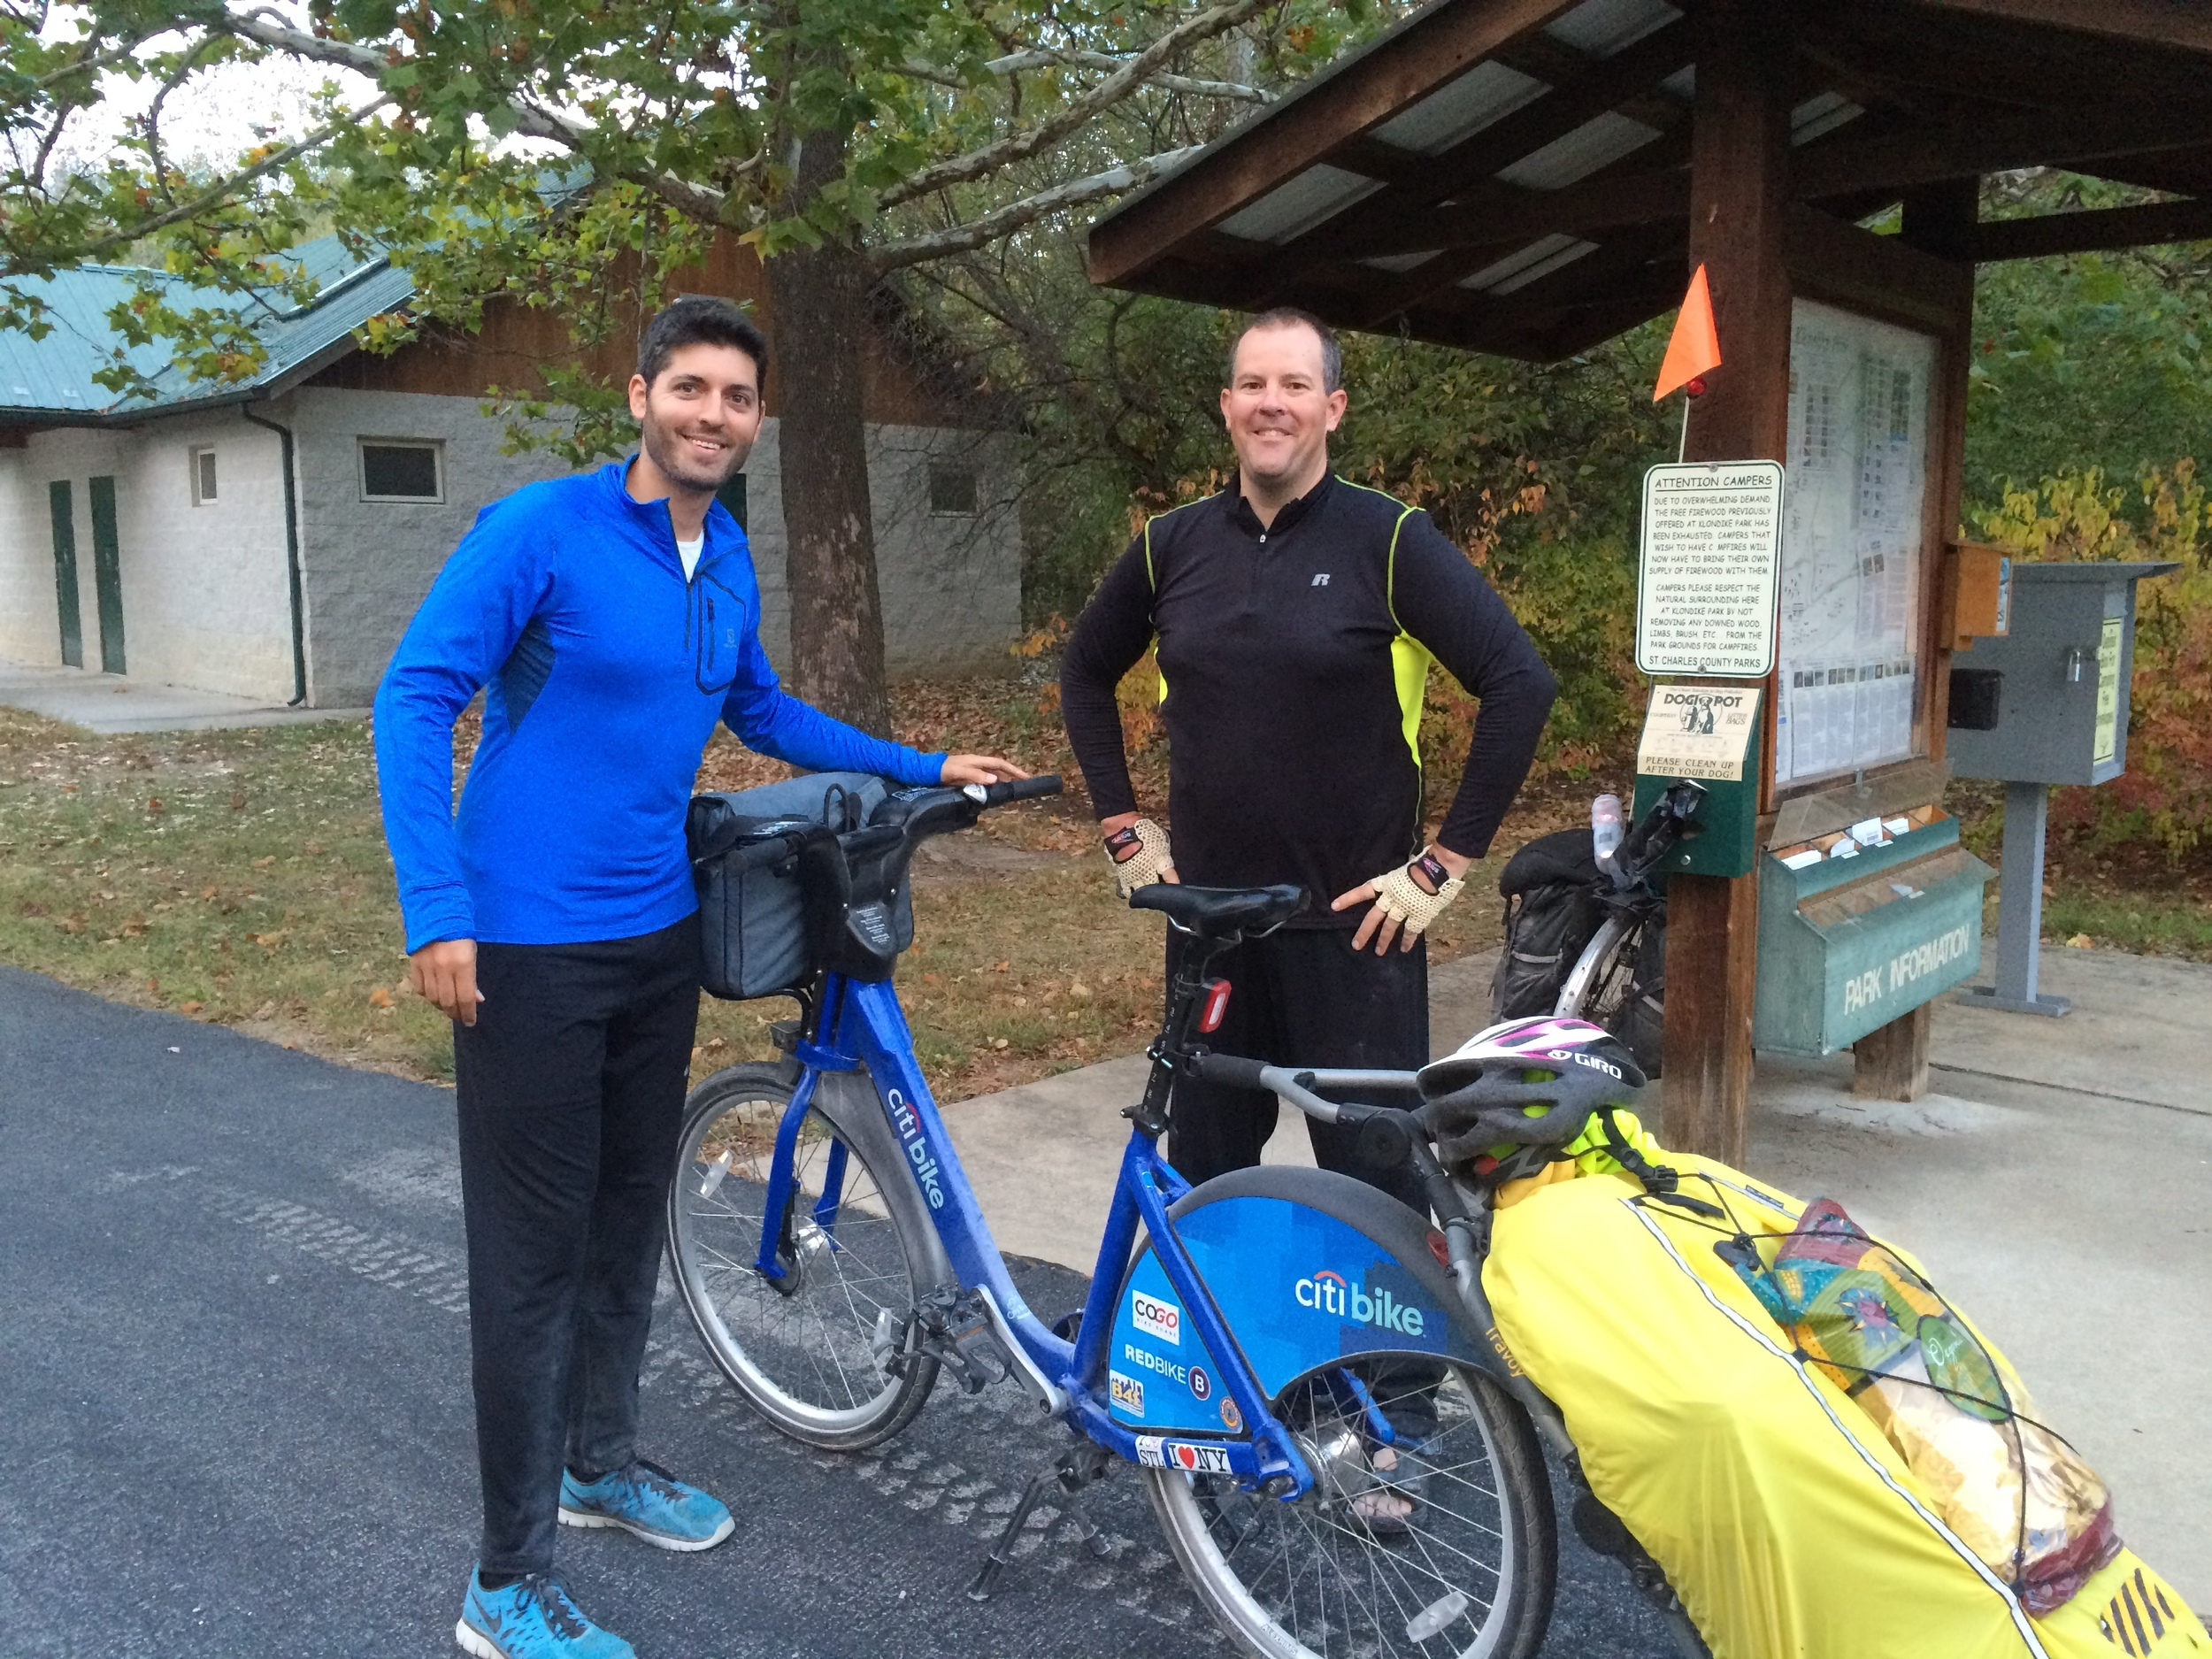 I met an Arkansas-based biker at Klondike Park Campground in Augusta, MO.